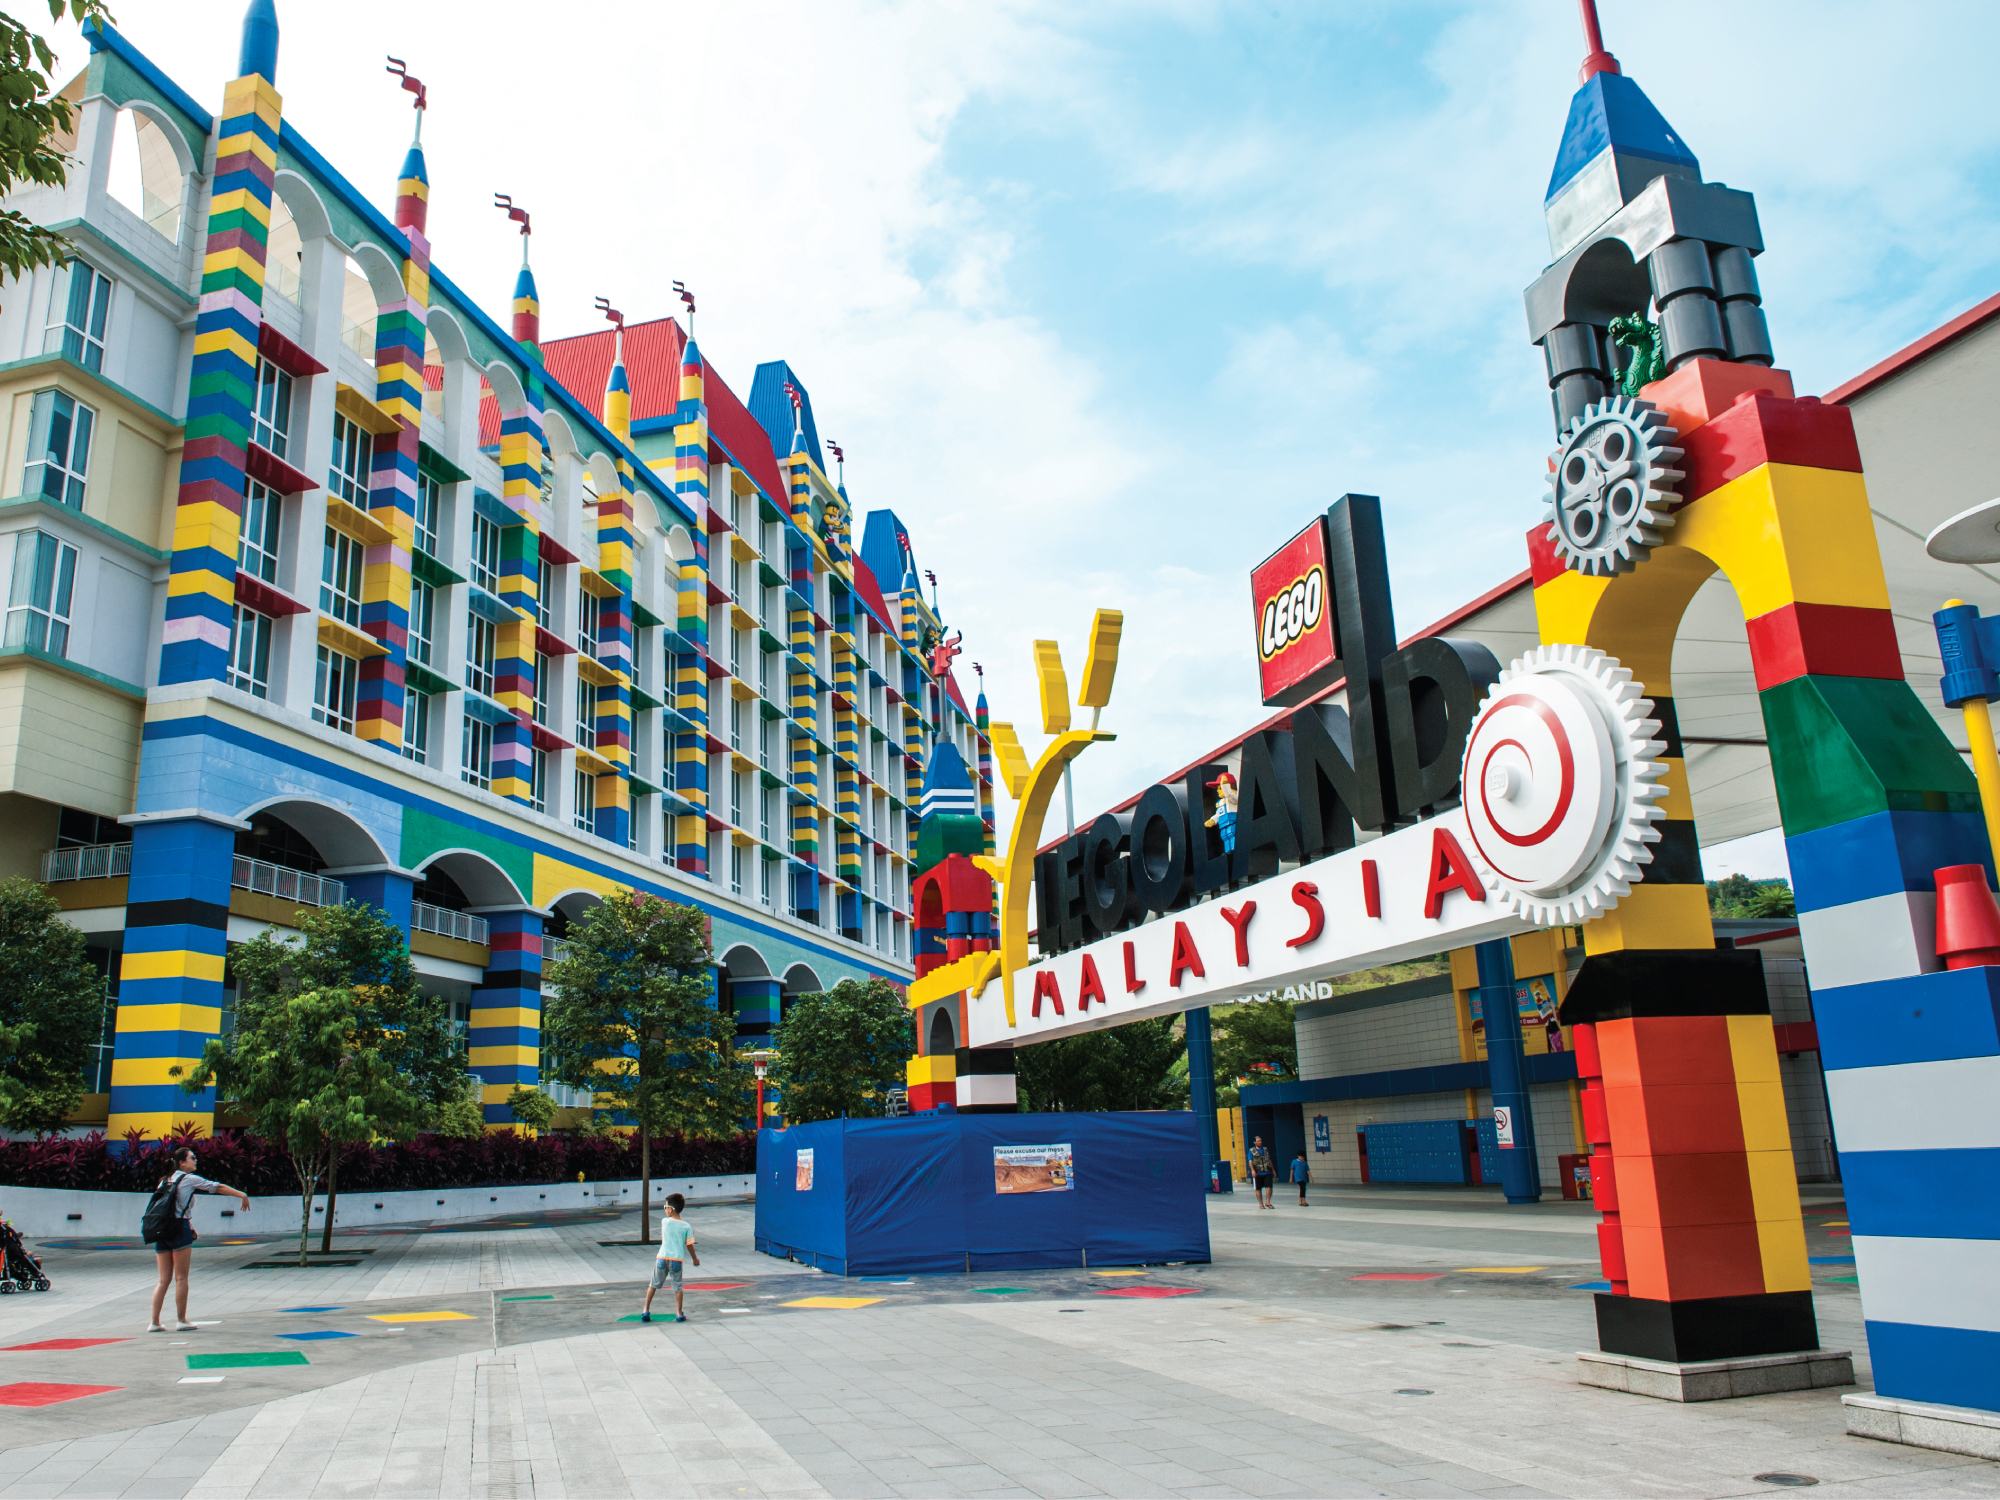 Johor Bahru Legoland - The Traveller